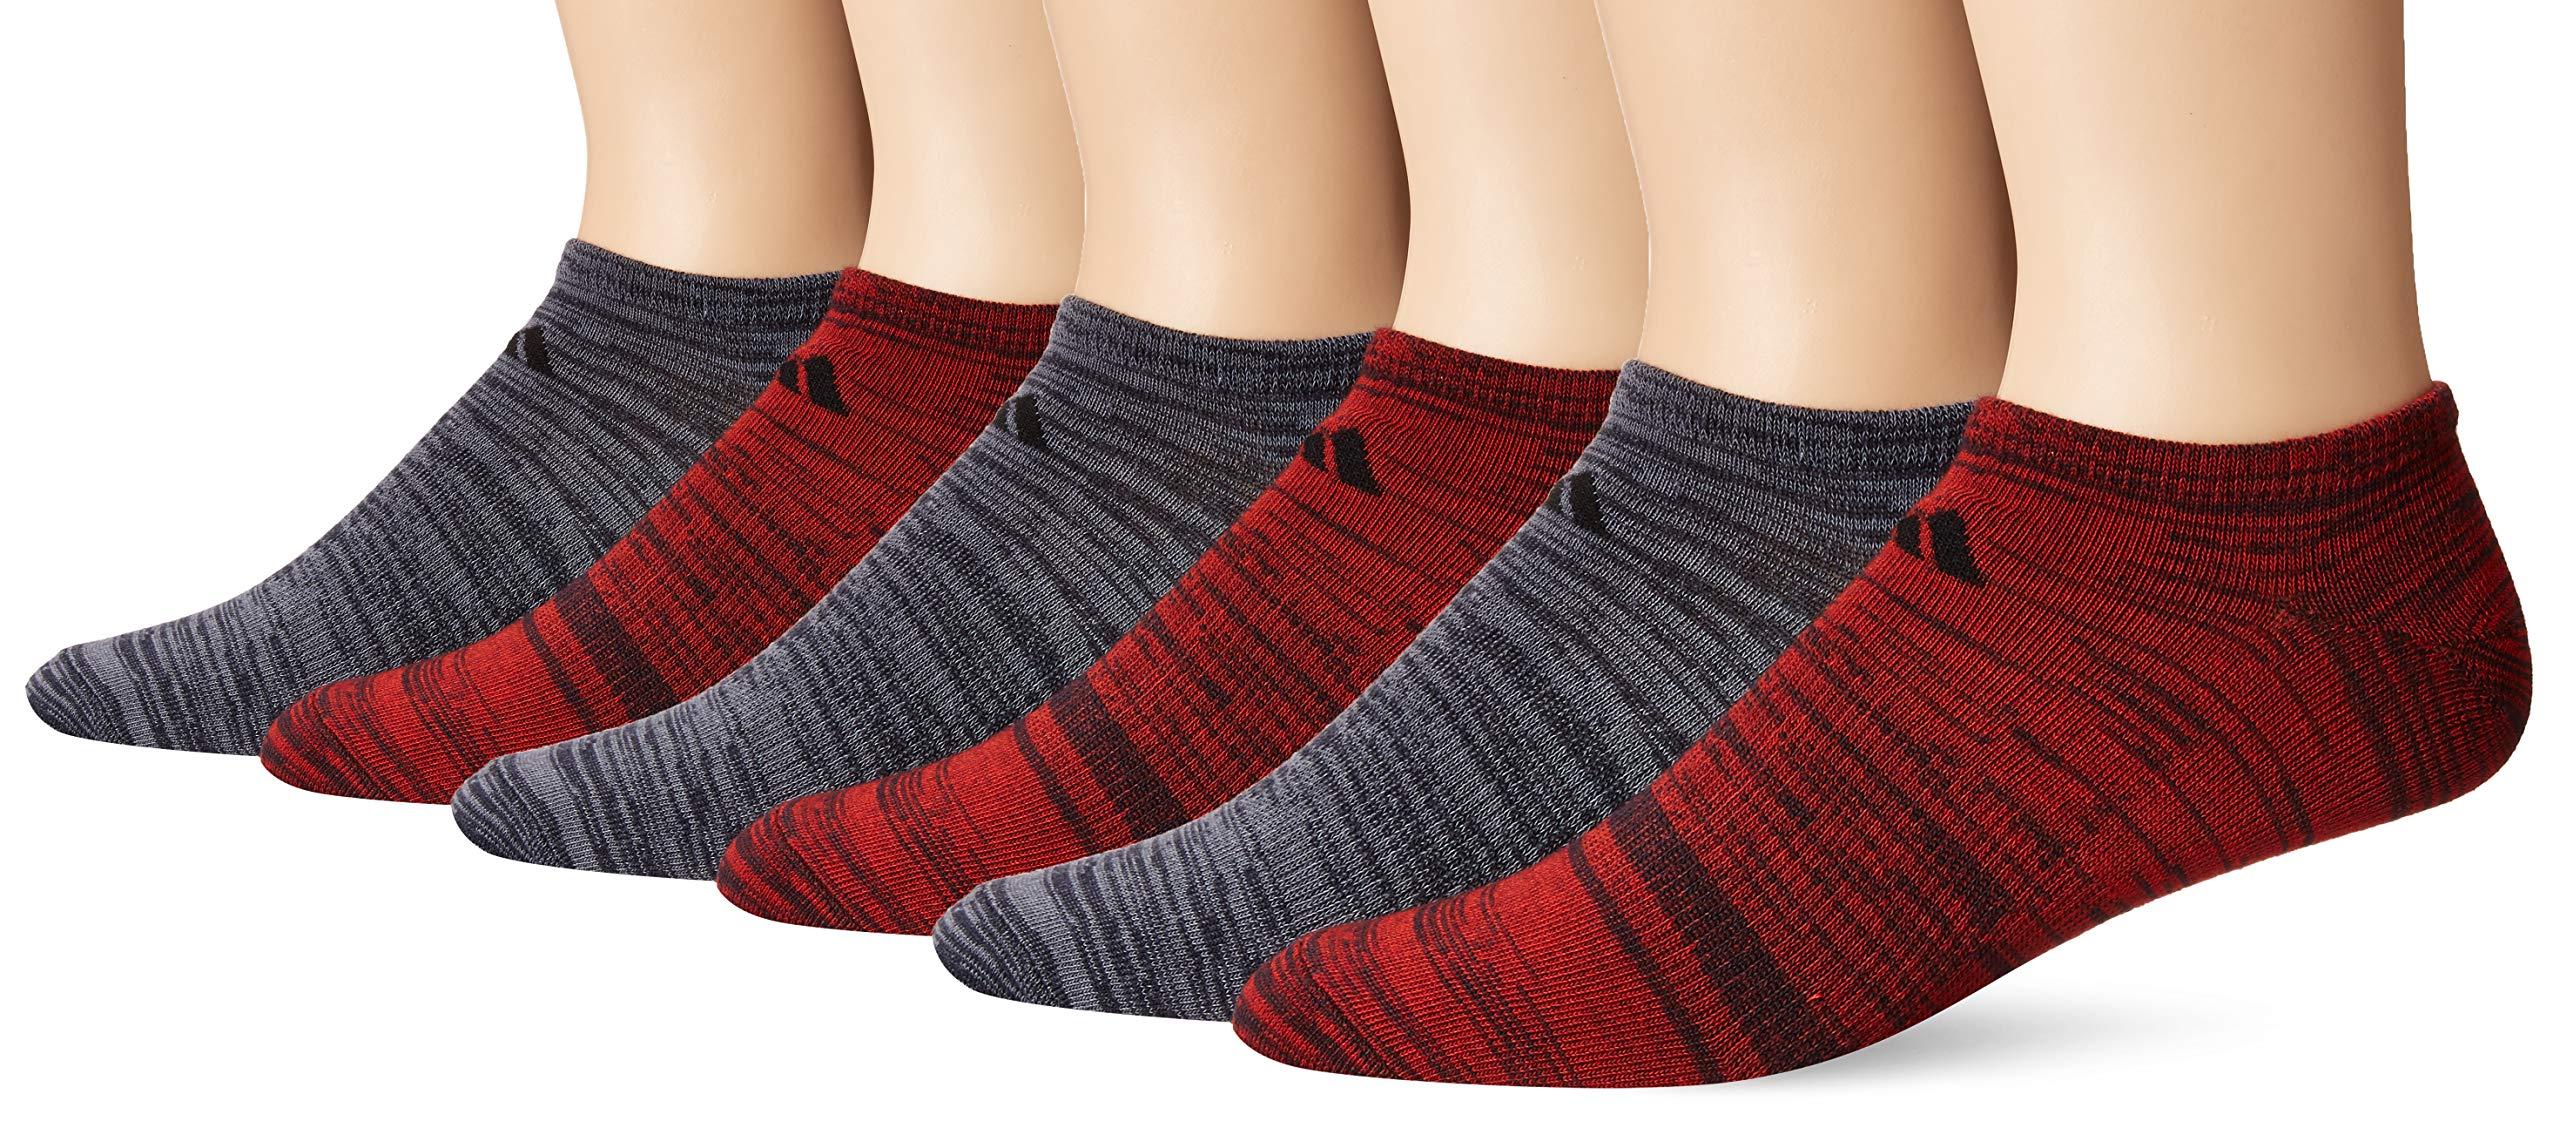 adidas Men's Superlite Low Cut Socks (6-Pair), Legend Ink Blue - Active Red Space Dye/Black Legend, Large, (Shoe Size 6-12) by adidas